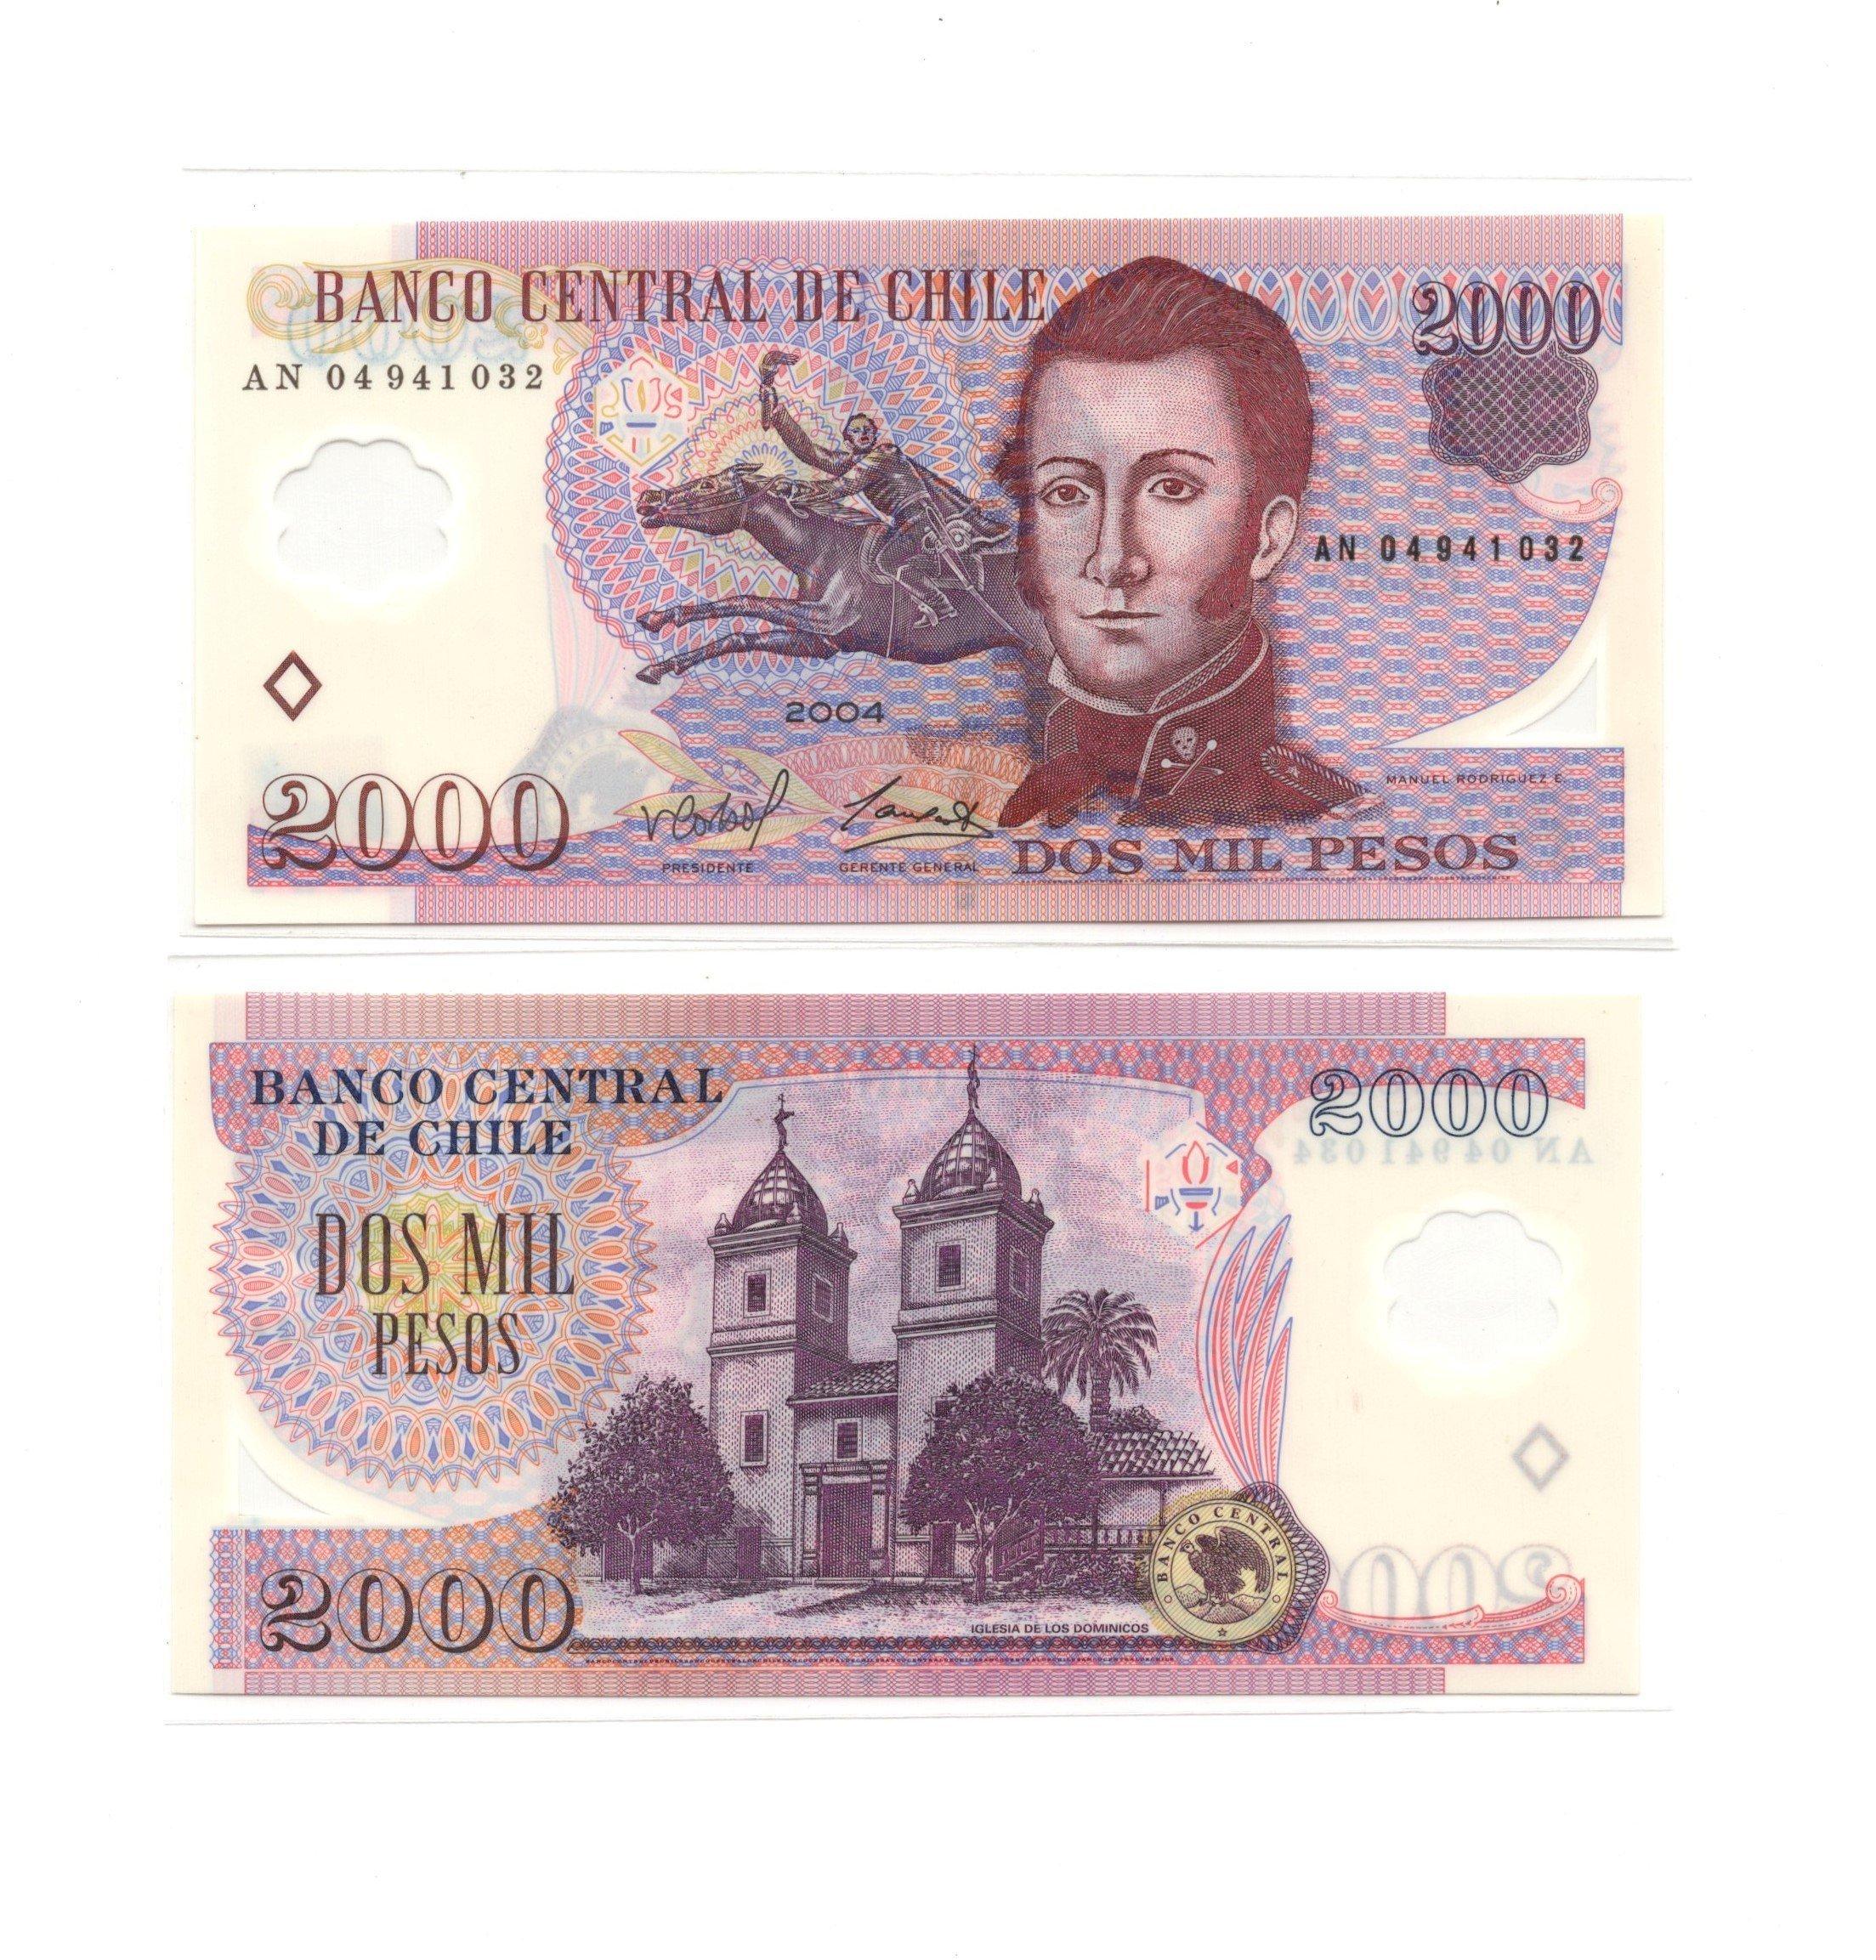 chile 2000 pesos polymer banknote